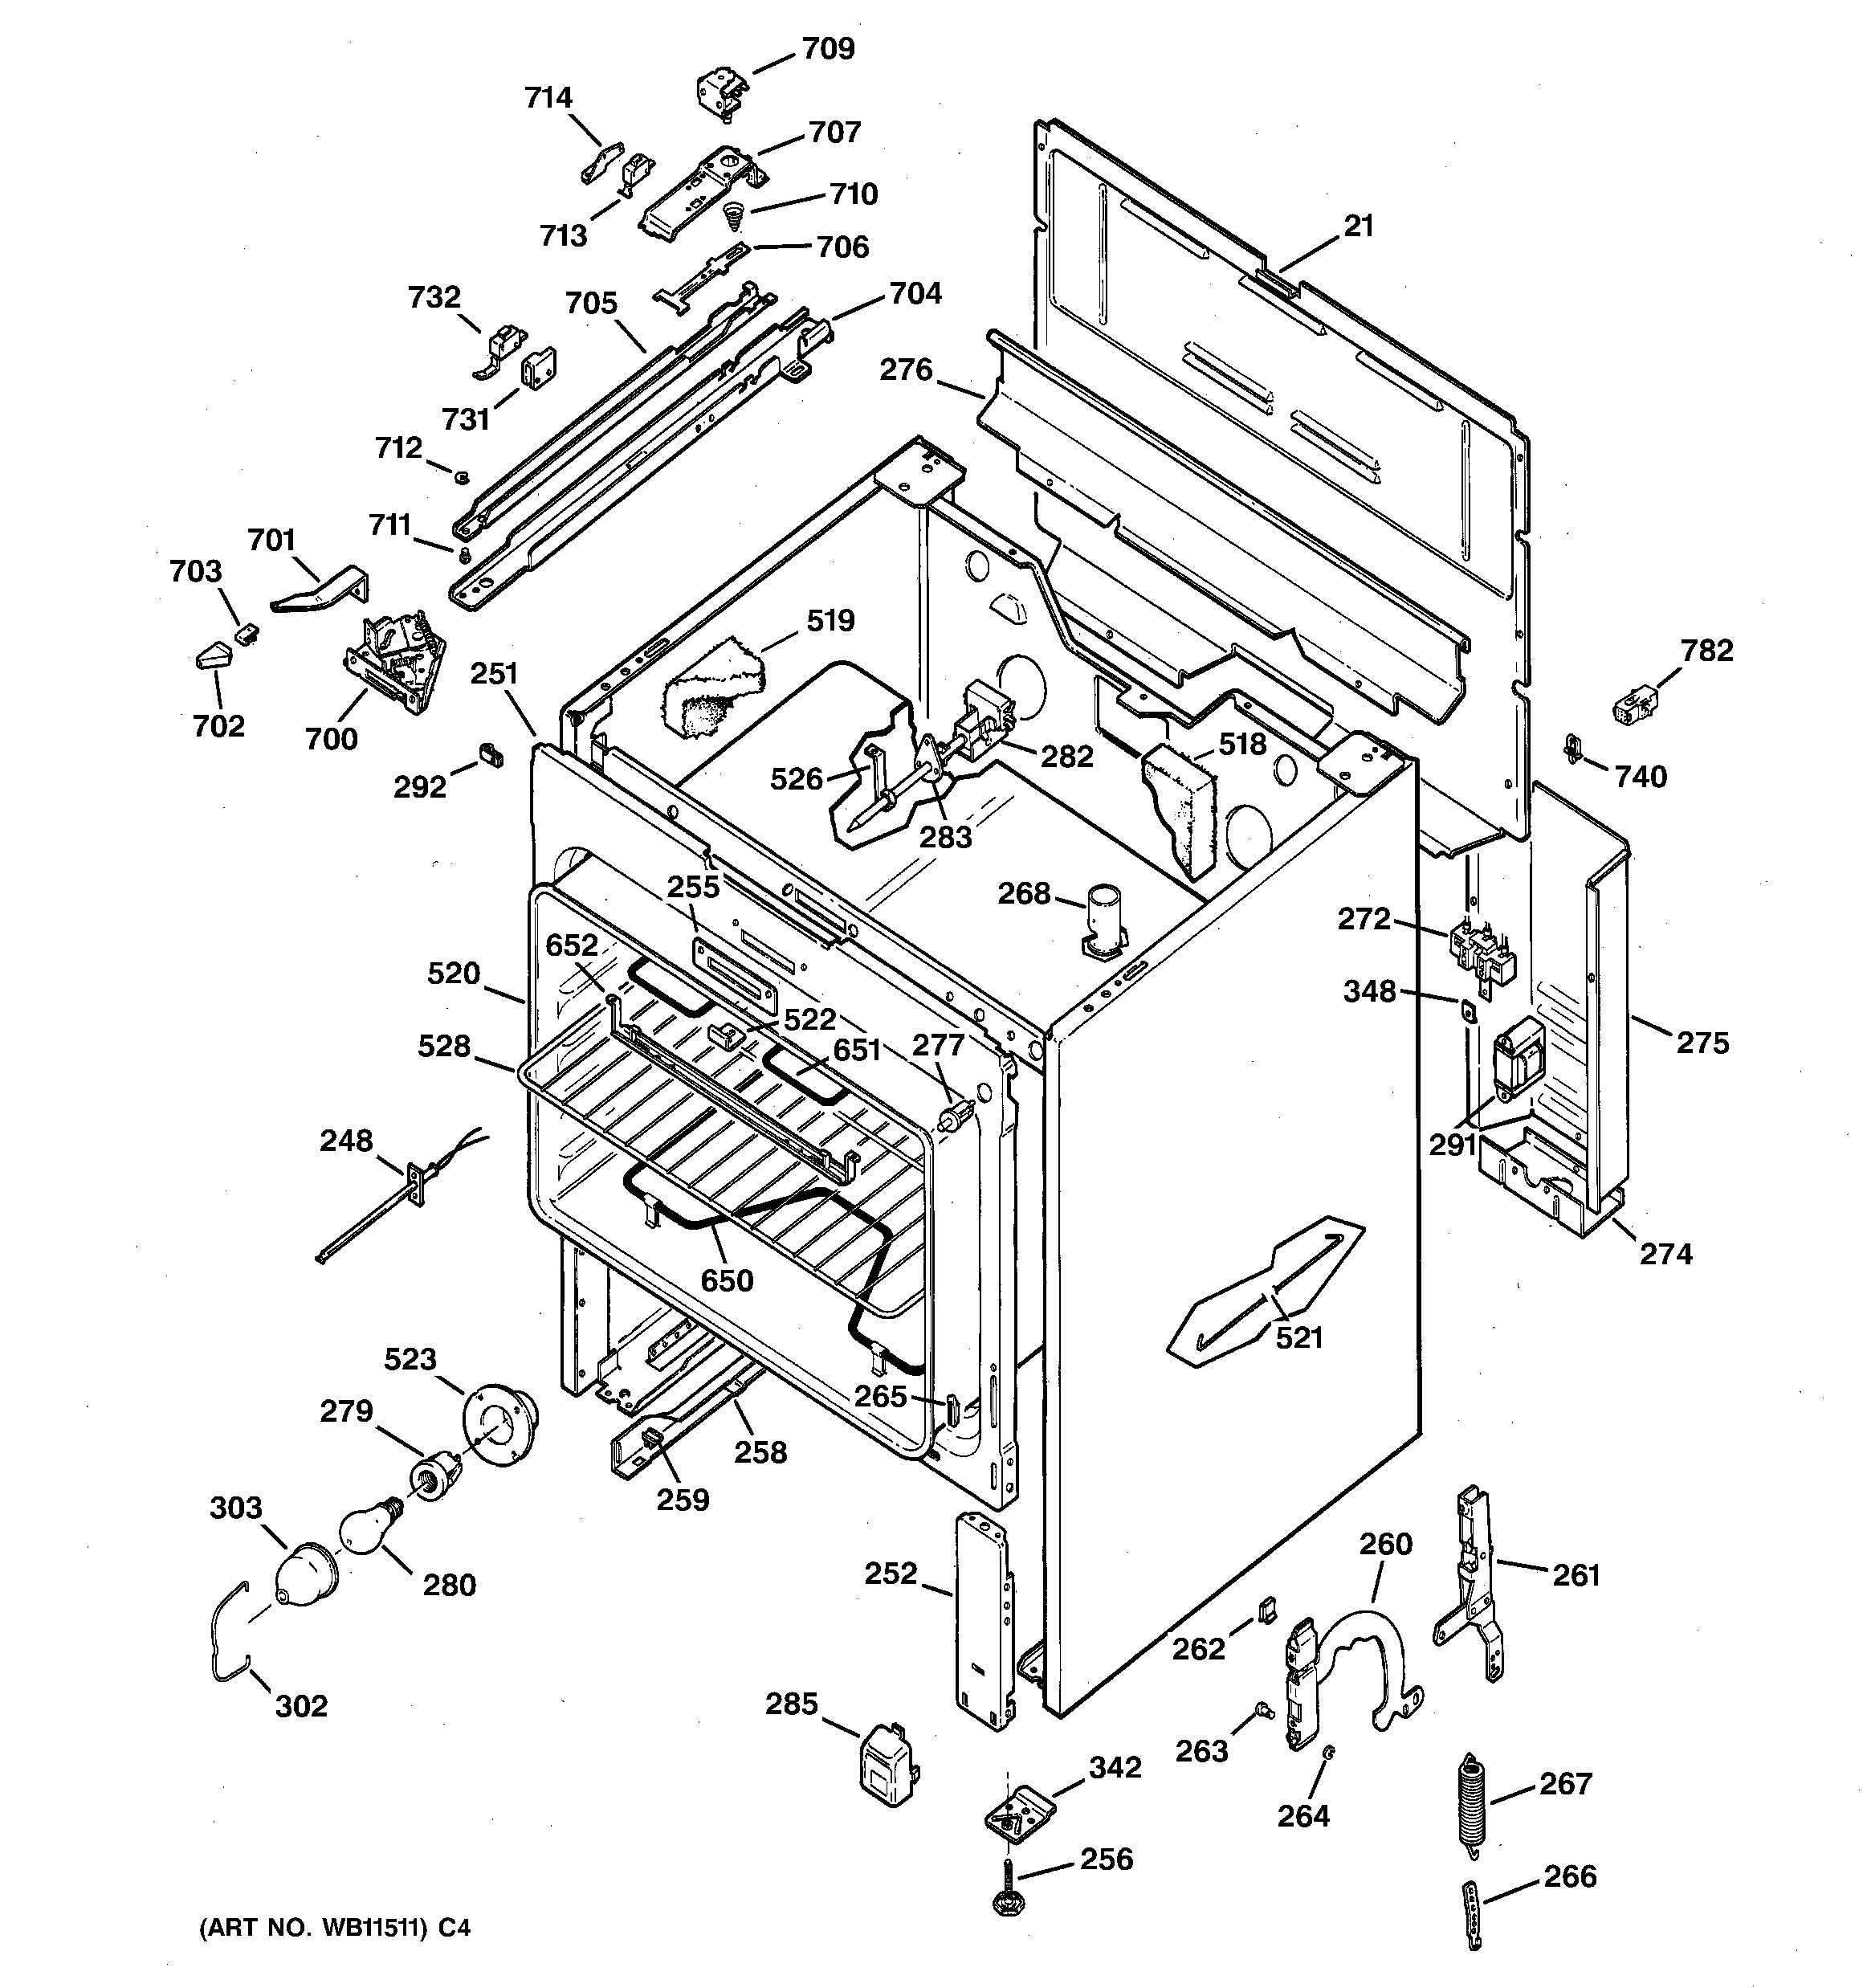 Ge Spectra Oven Wiring Diagram - 09 Passat Trailer Wiring Harness On -  2006cruisers.yenpancane.jeanjaures37.fr | Ge Spectra Electric Range Wiring Diagram |  | Wiring Diagram Resource